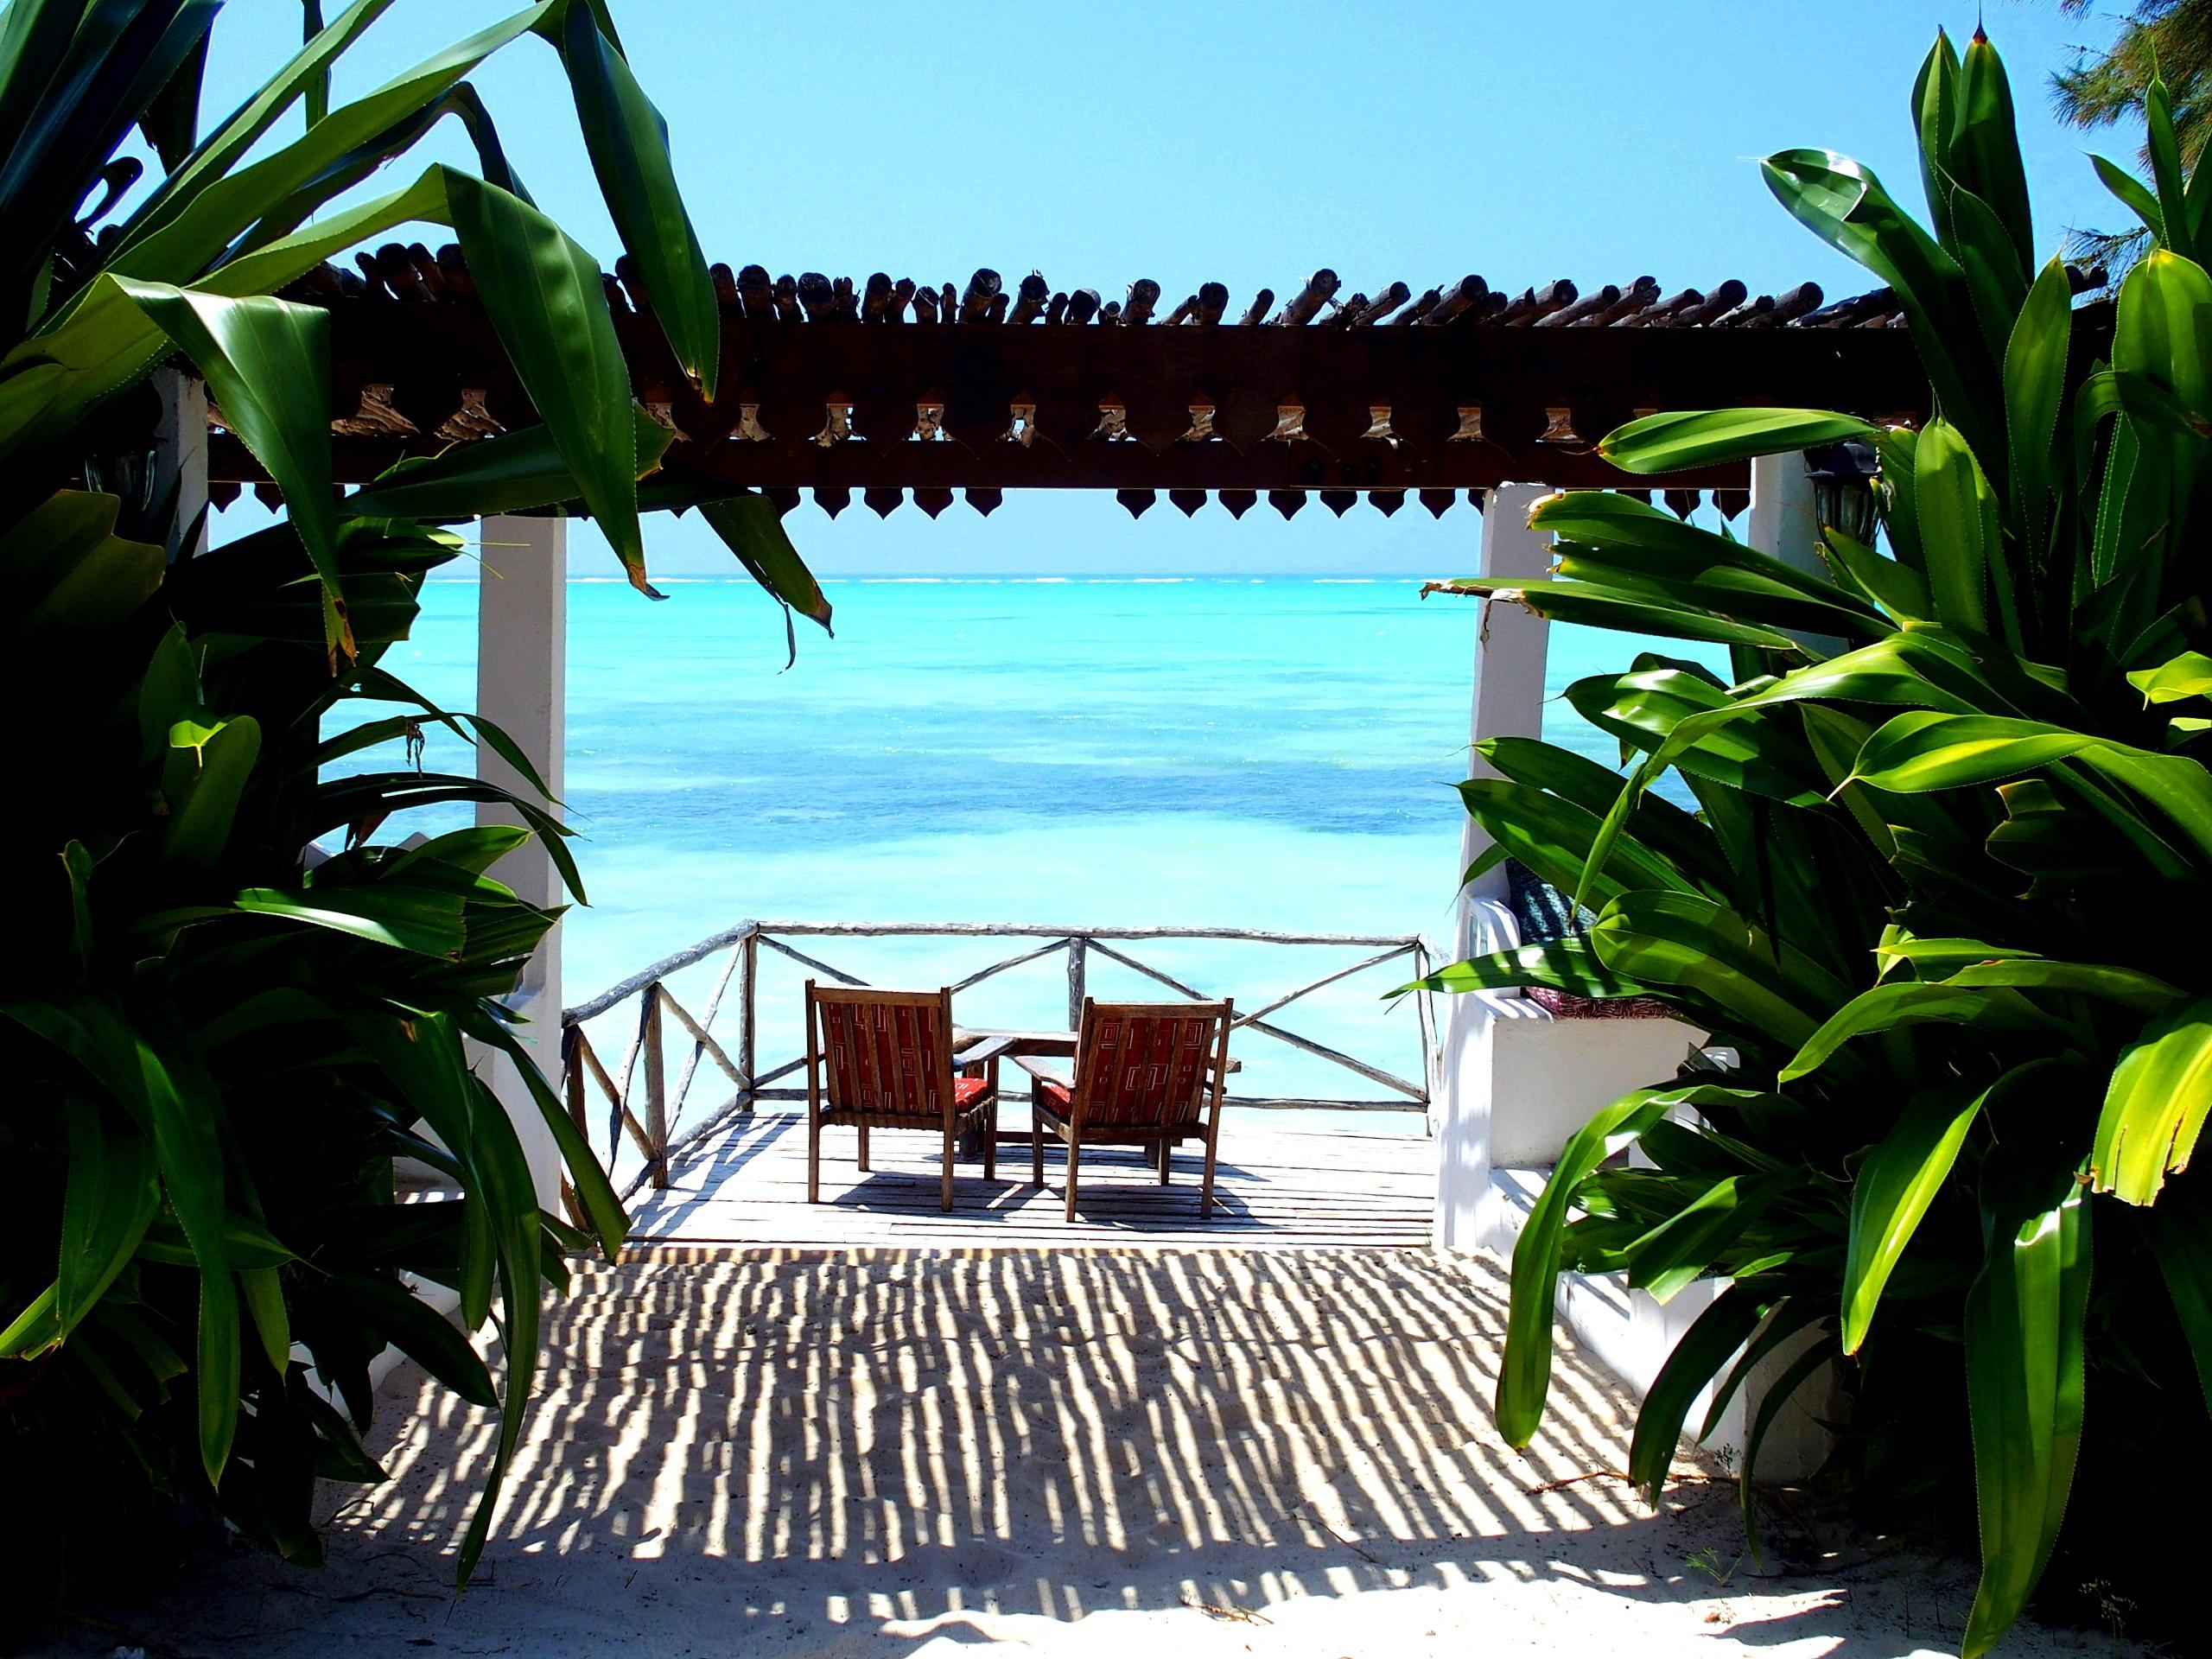 Hâvre de paix Hotel Seasons lodge Pongwe Zanzibar